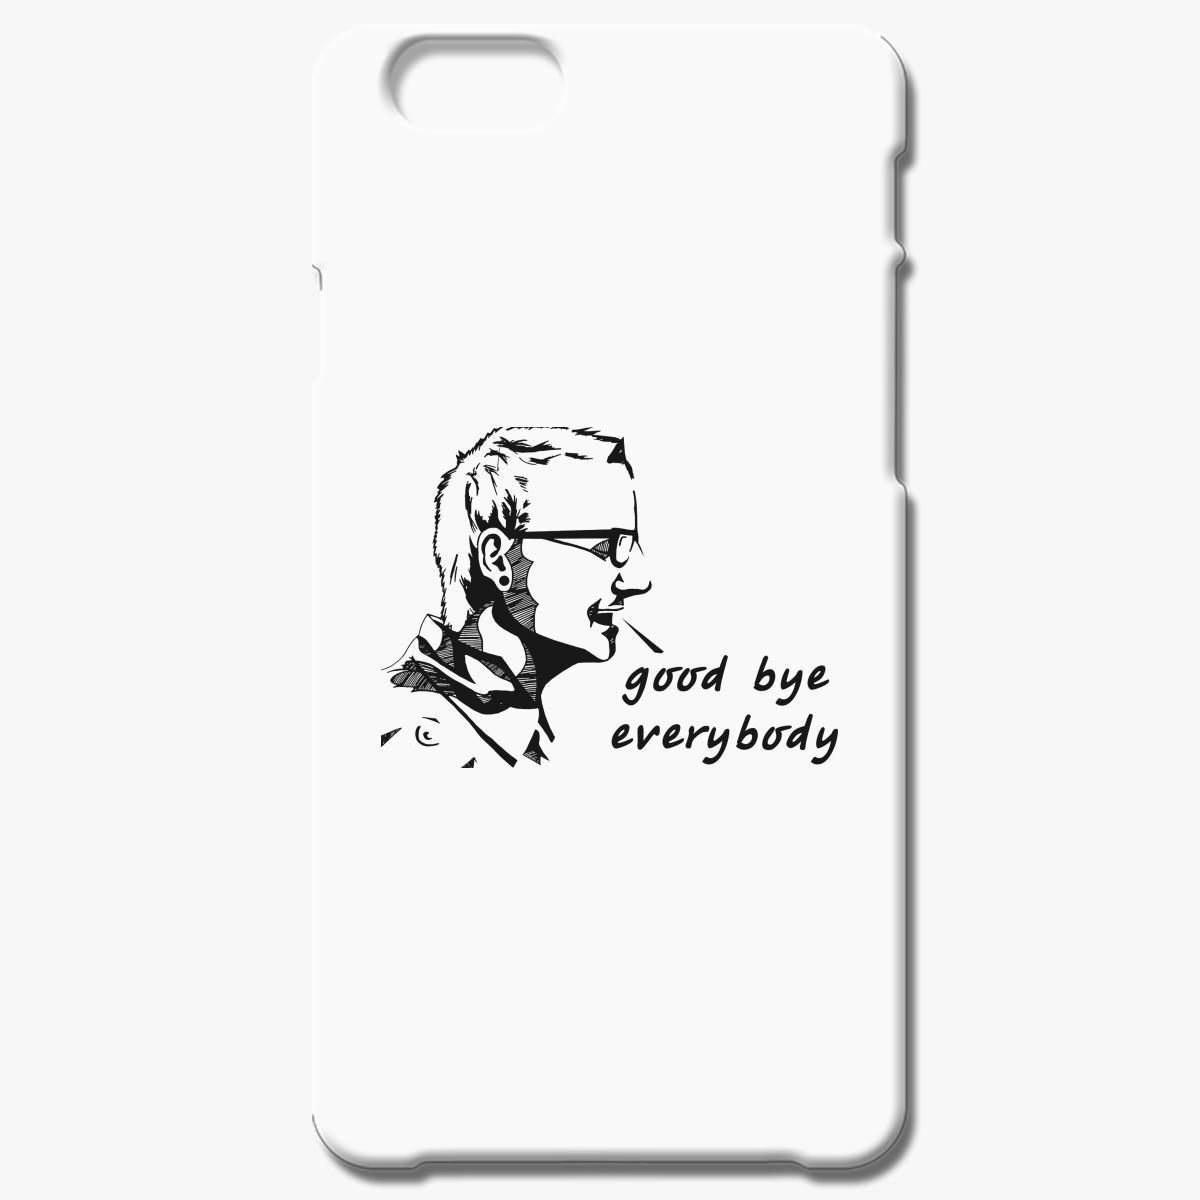 Rip Chester Bennington 3 Iphone 8 Plus Case